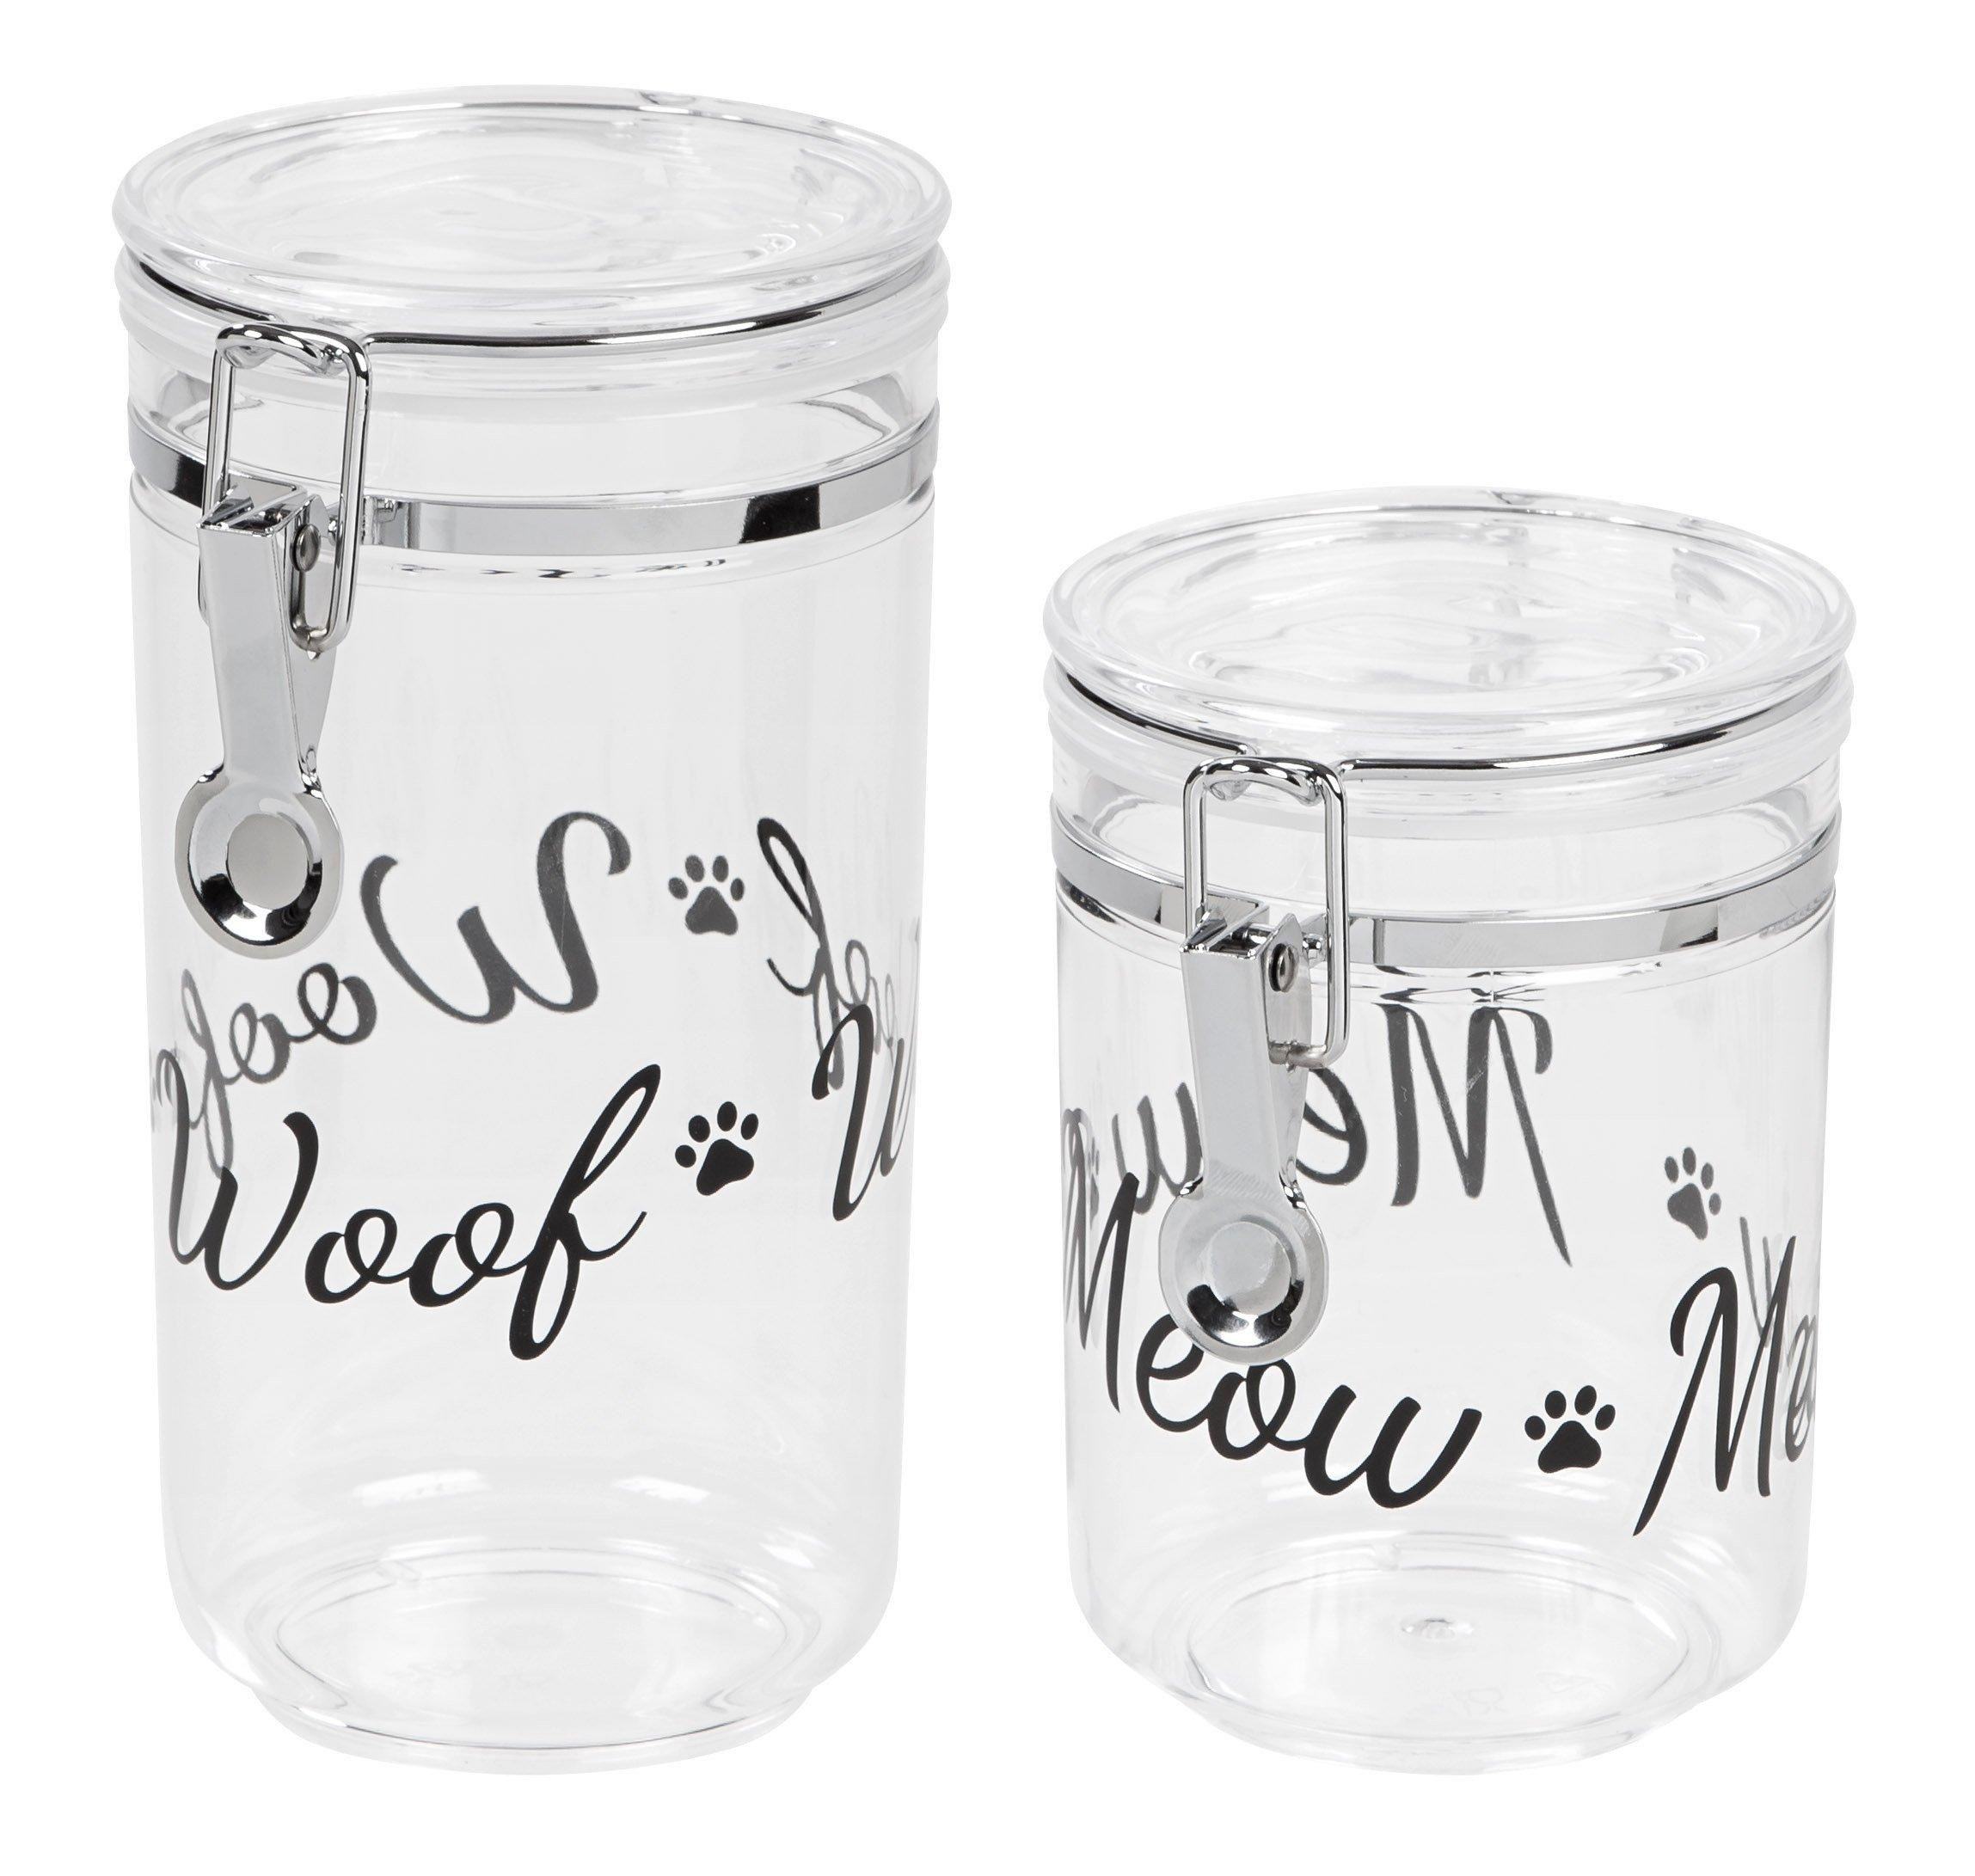 IRIS Acrylic Meow & Woof Pet Treat Jar, Black